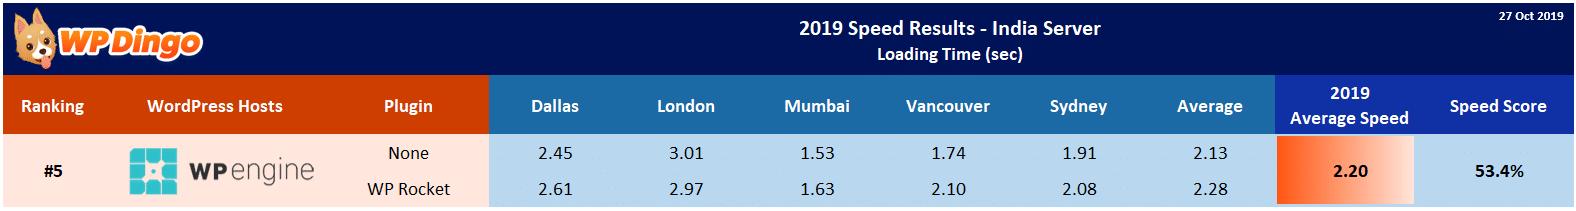 2019 WP Engine Speed Table - India Server